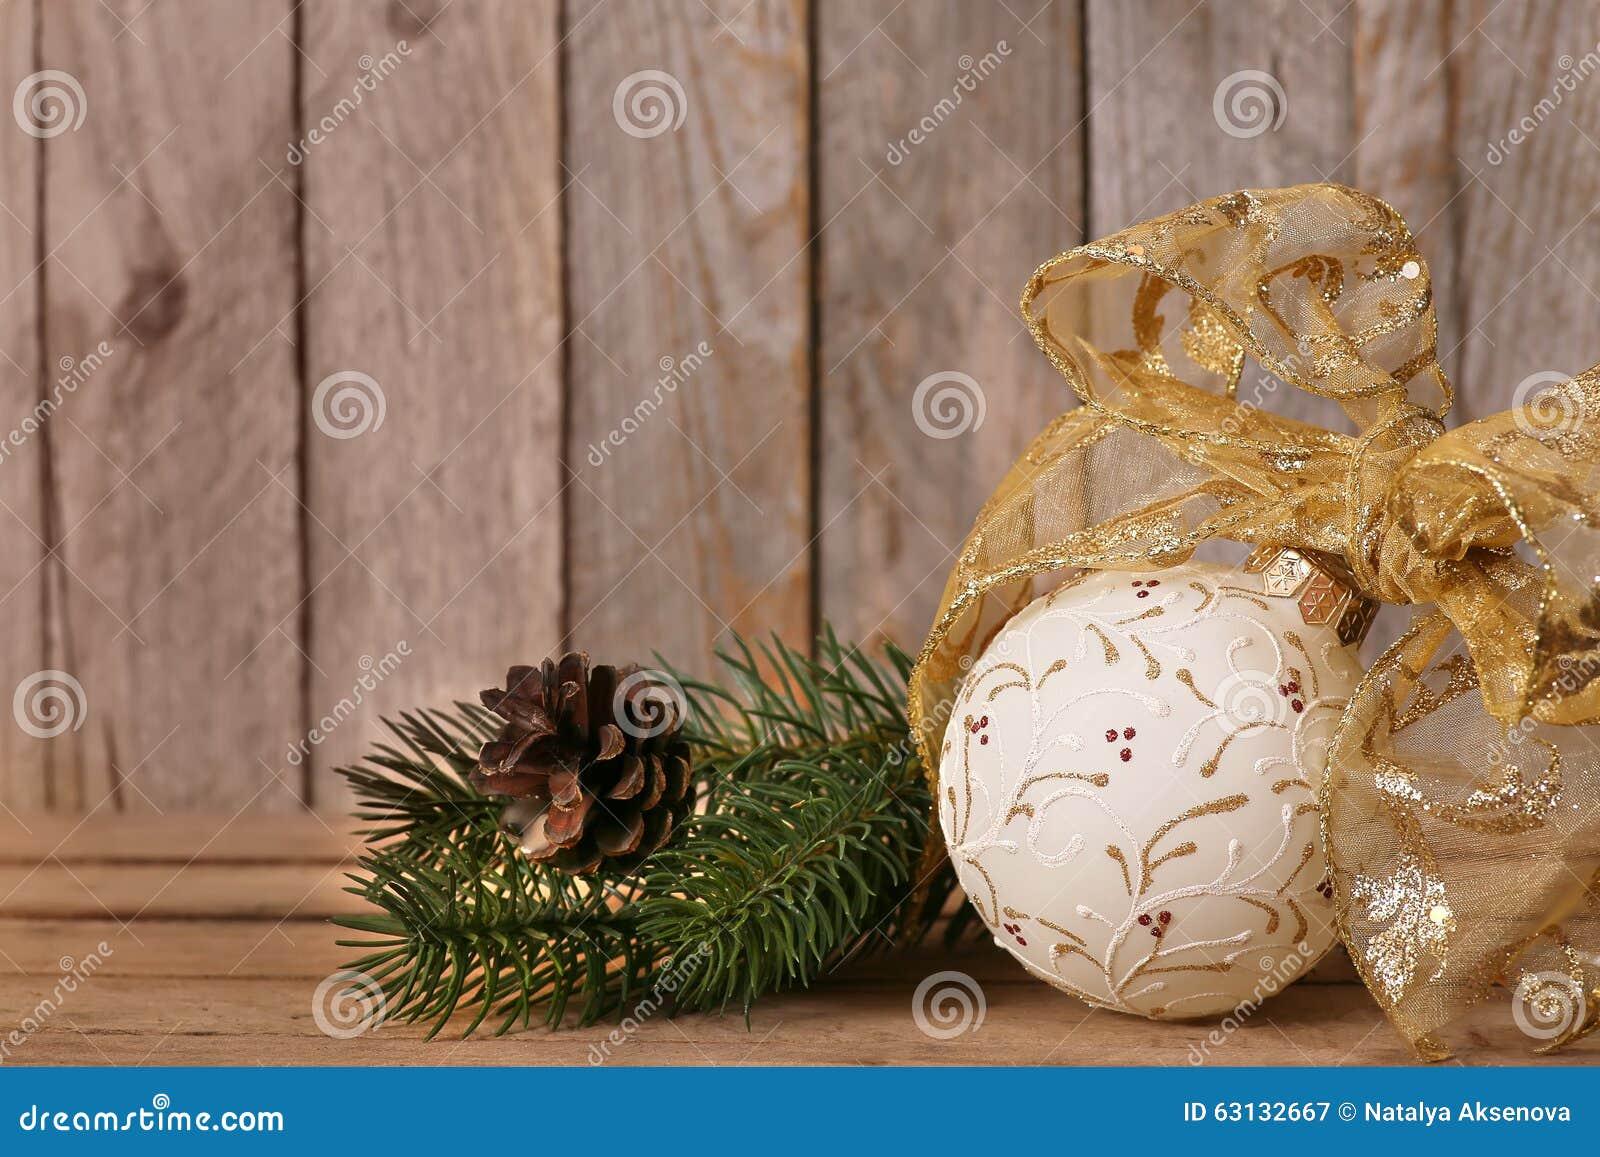 Christmas decoration on old grunge wooden board stock image image 63132667 - Grune dekoration ...